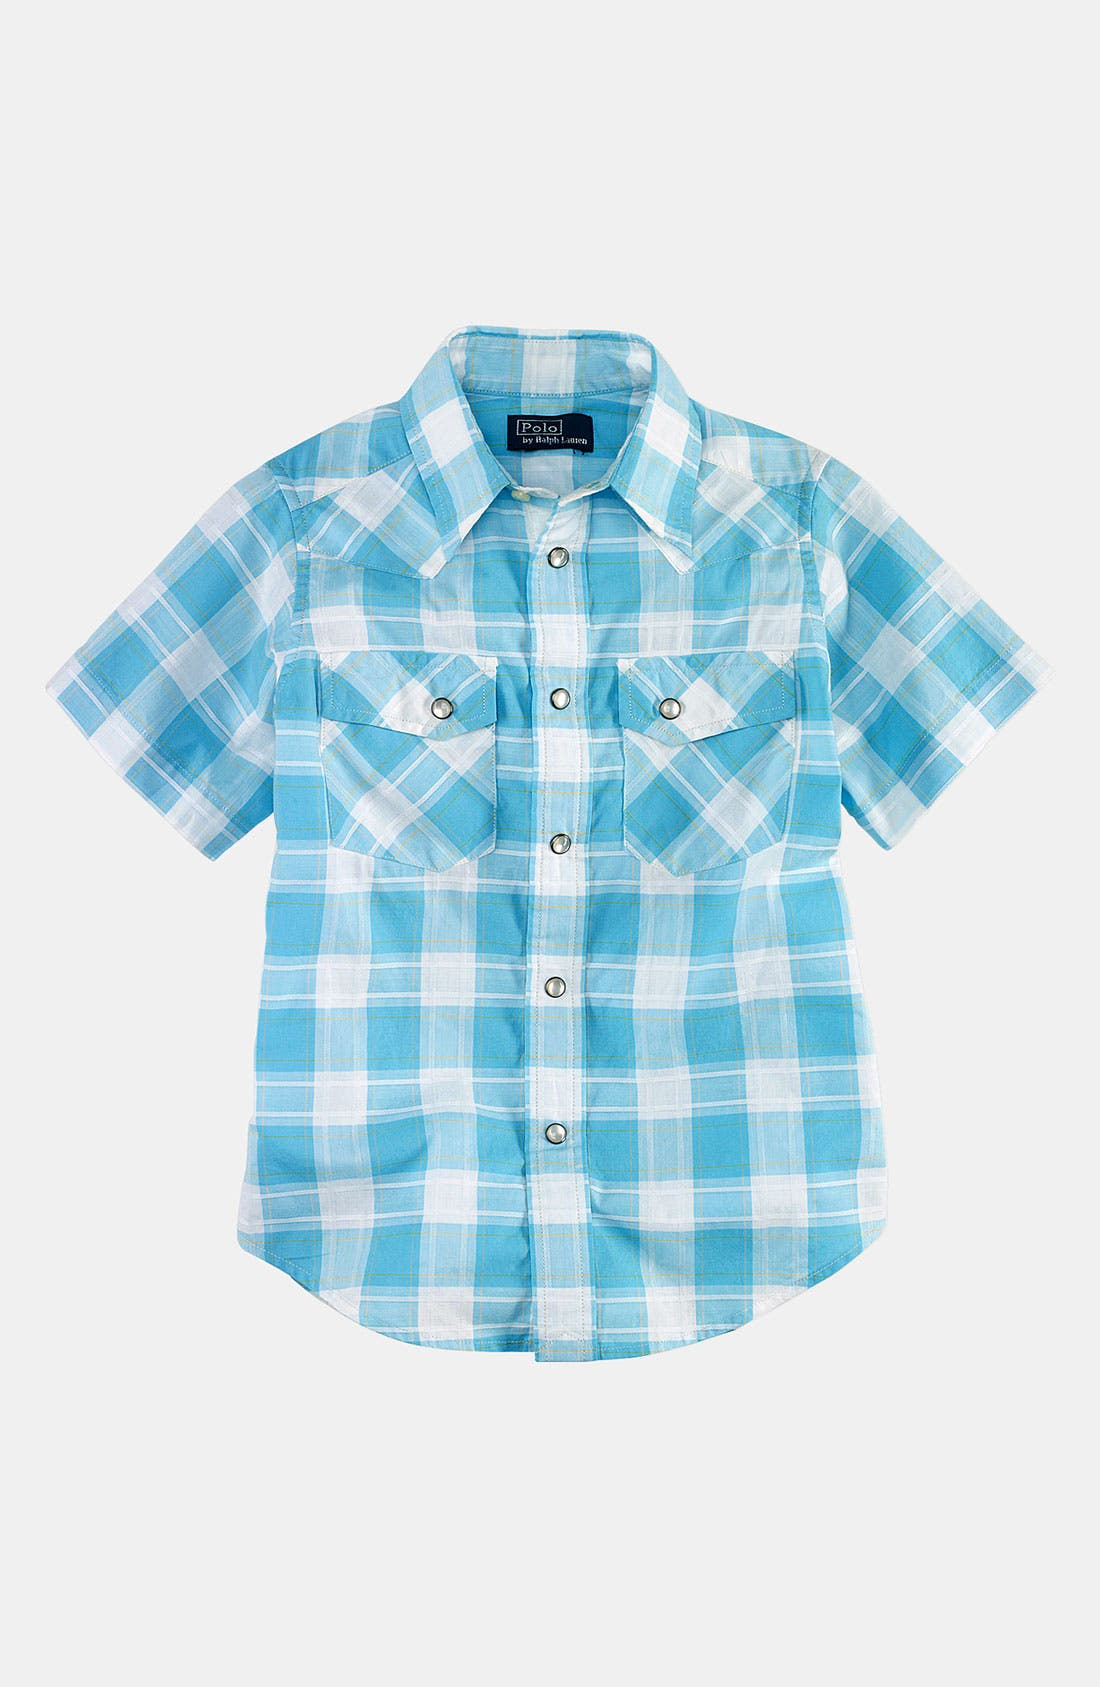 Alternate Image 1 Selected - Ralph Lauren Short Sleeve Shirt (Toddler)